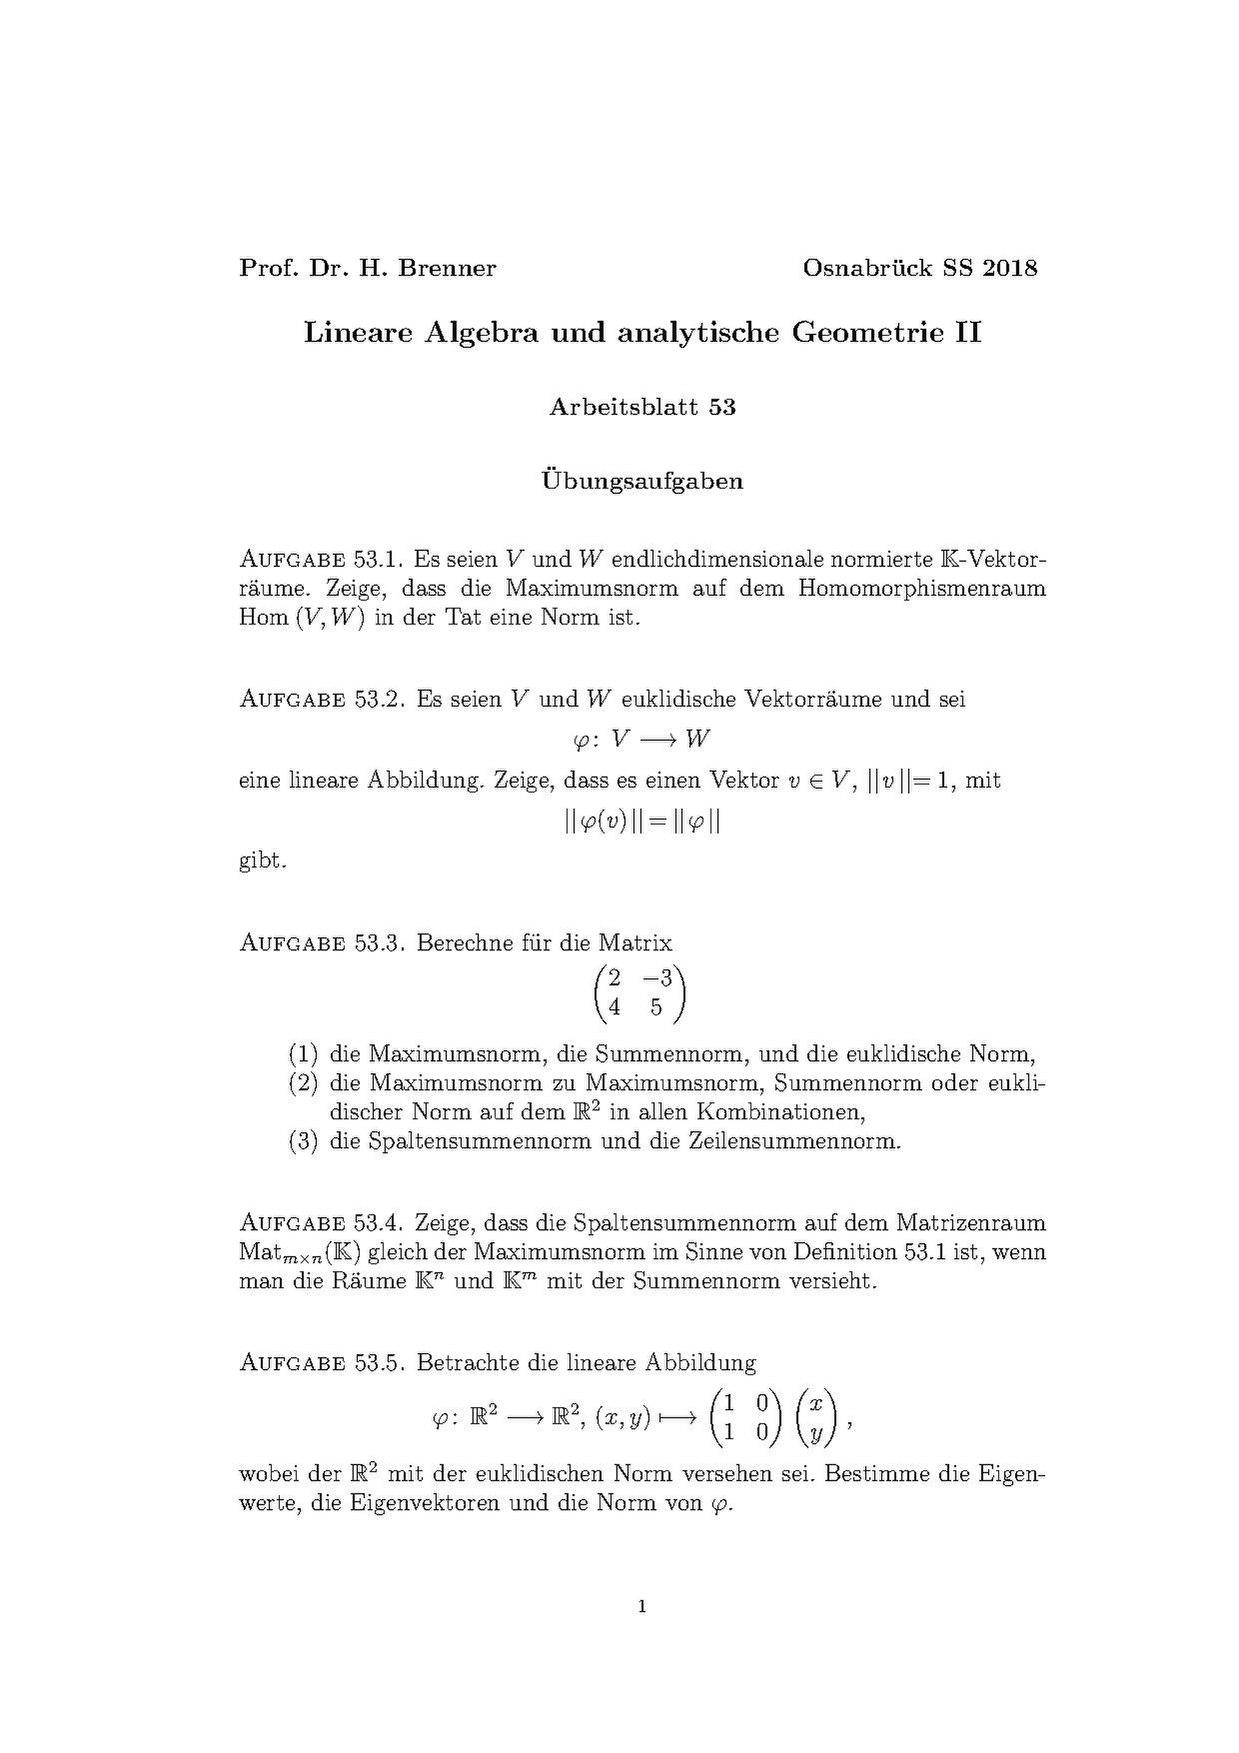 Fantastisch Algebra II Arbeitsblatt Bilder - Arbeitsblatt Schule ...